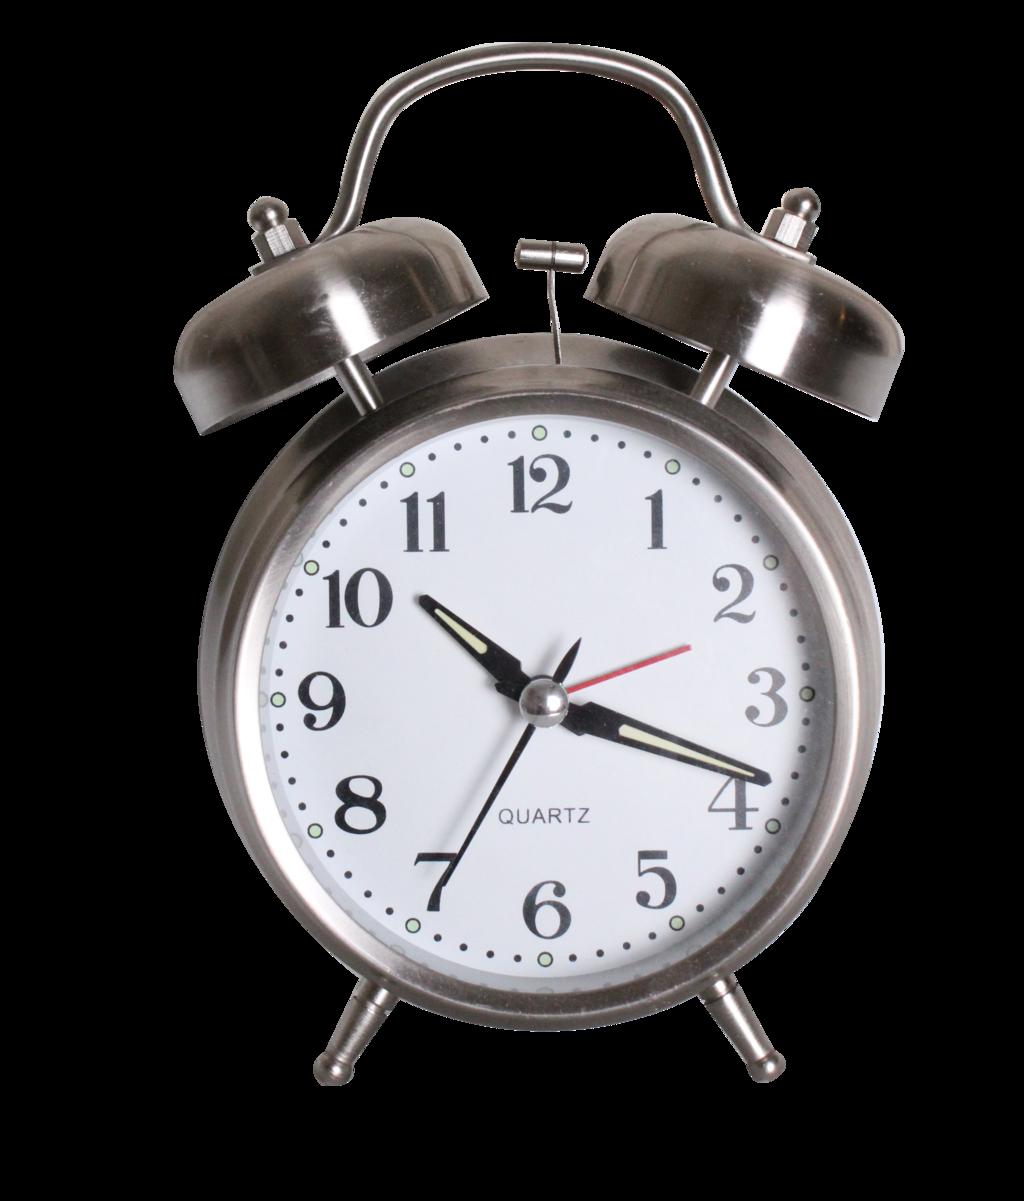 Clock Web Design